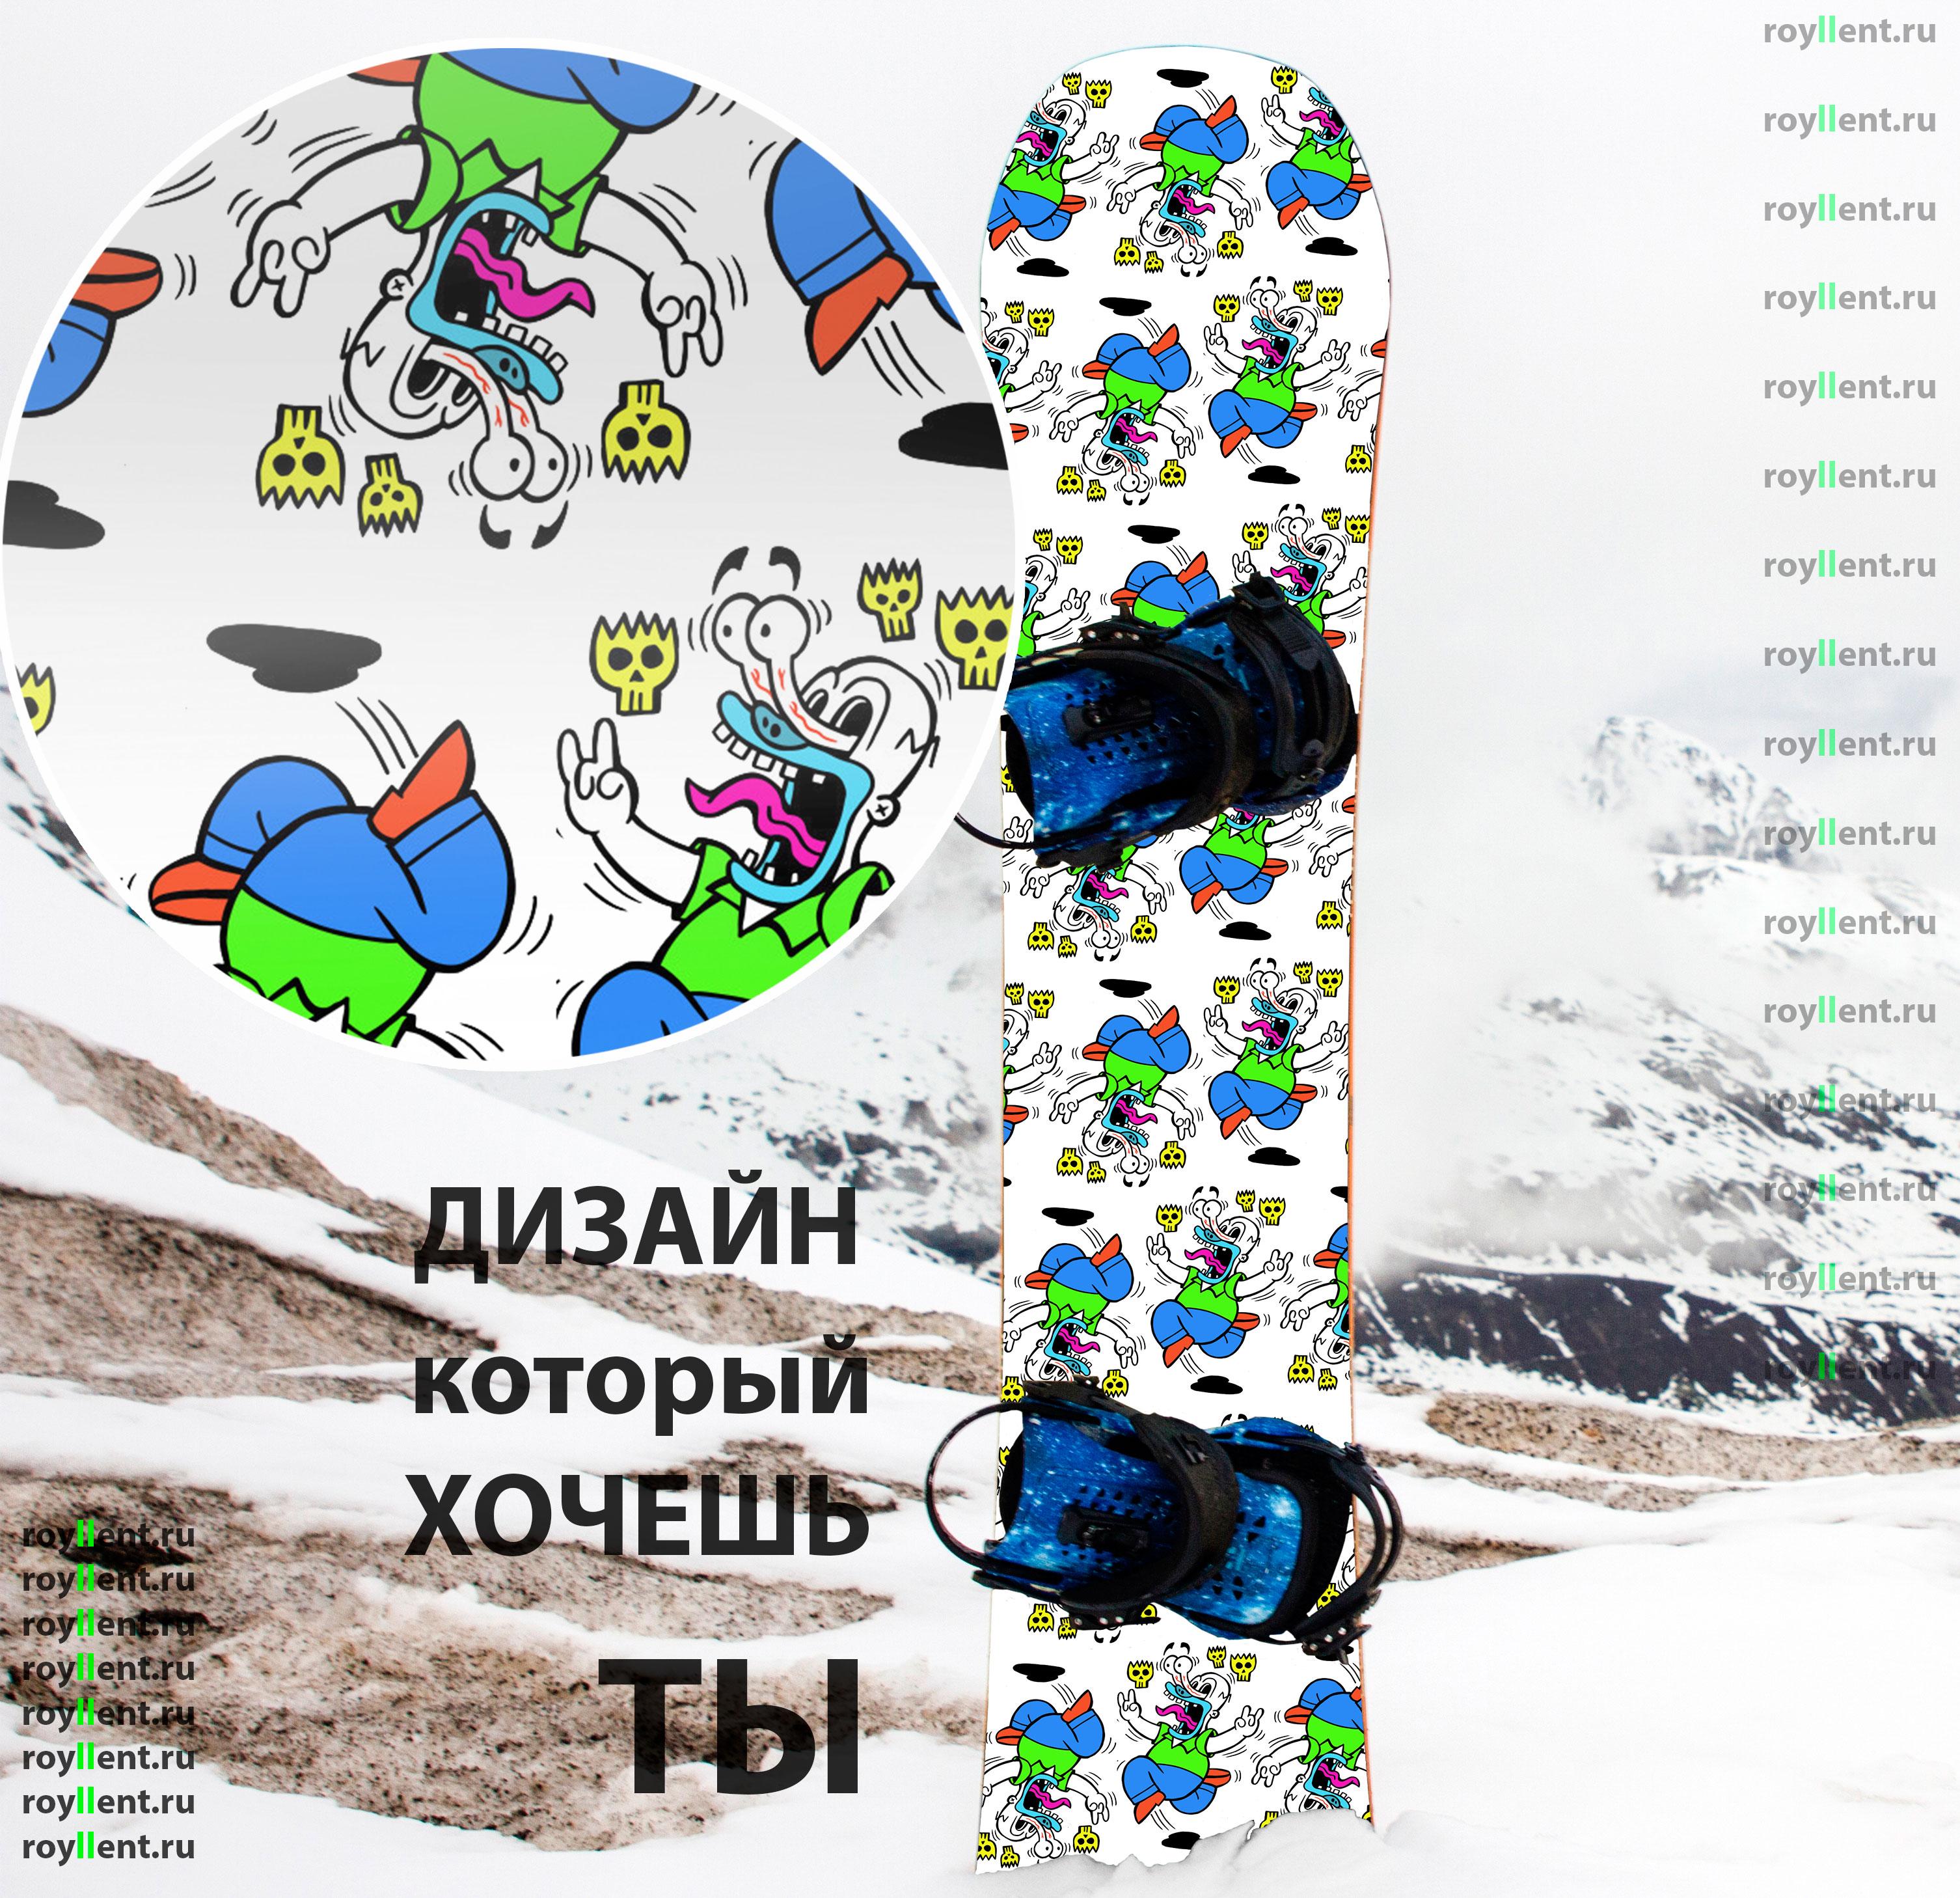 Наклейка на сноуборд Наклейка на сноуборд adidas eyewear, Airblaster, Amplid, Arbor, Bataleon, Bent Metal, Bonfire, Burton, CAPiTA, Coal, Deeluxe, Dragon, Drake, Electric, Endeavour, Giro, GoPro, HEAD, Jones, K2, Korua Shapes, L1, Lazer, Level, Lib Tech, Lobster, Melon, Neff, Nidecker, Nike Goggles